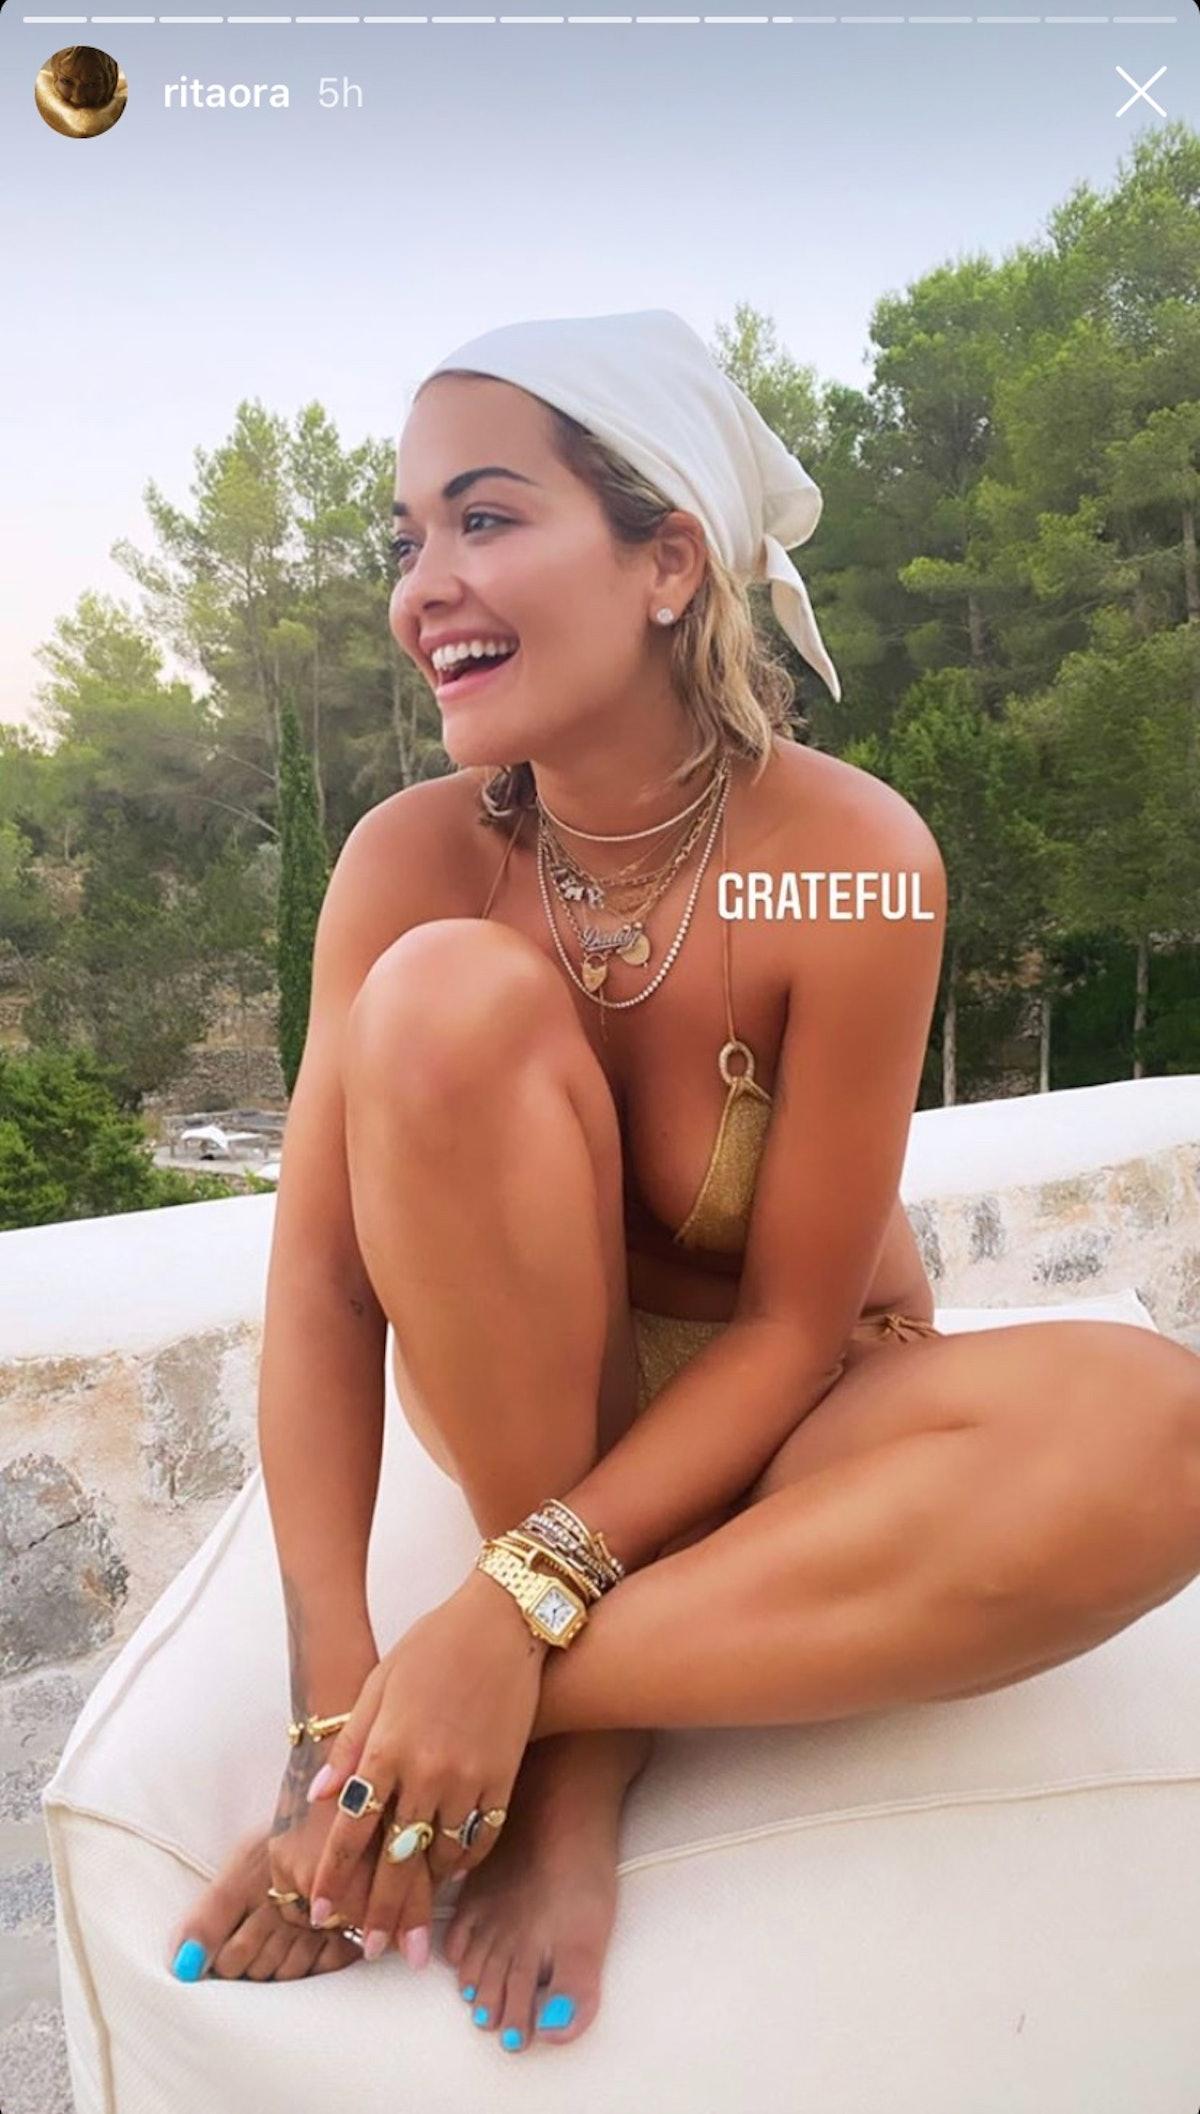 Rita Ora's aqua toenail polish popped perfect against her gold bikini